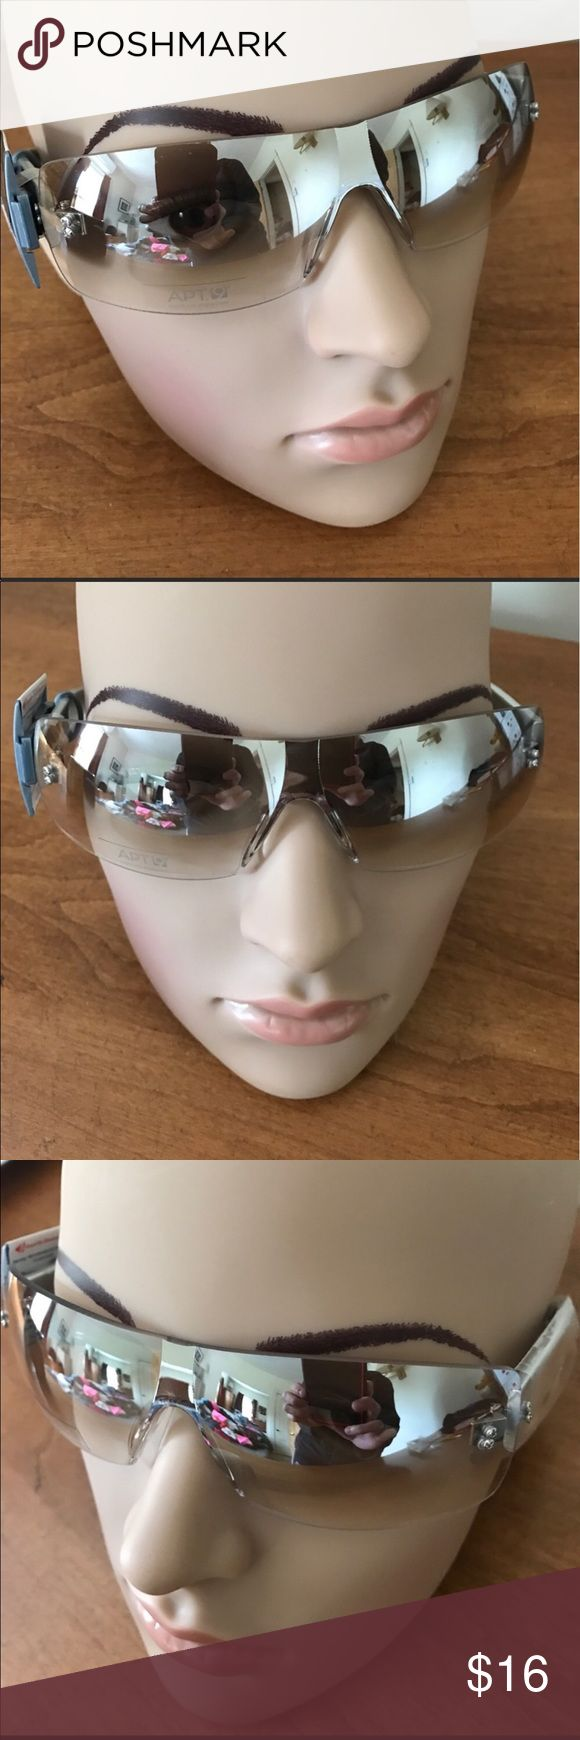 ☀️New Women's 100% UV Sunglasses New Women's 100% UV Sunglasses. New with tags. 100% UV Protection. Apt.9 Accessories Sunglasses